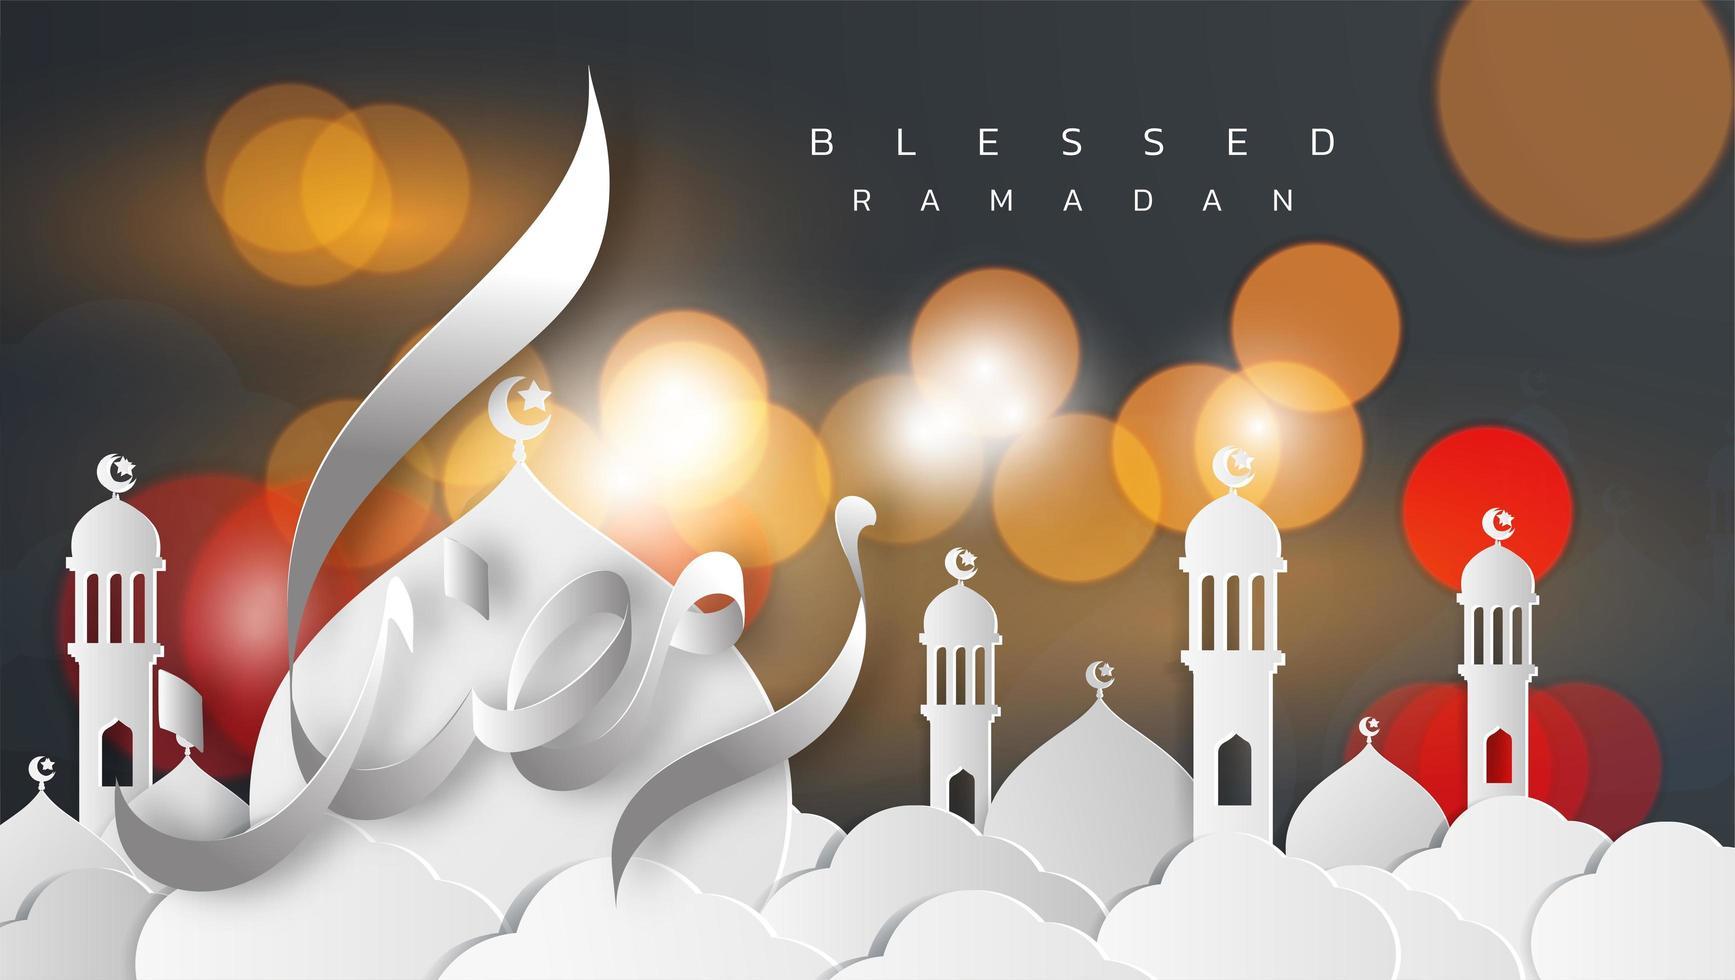 estilo de papel ramadan kareem cartão vetor